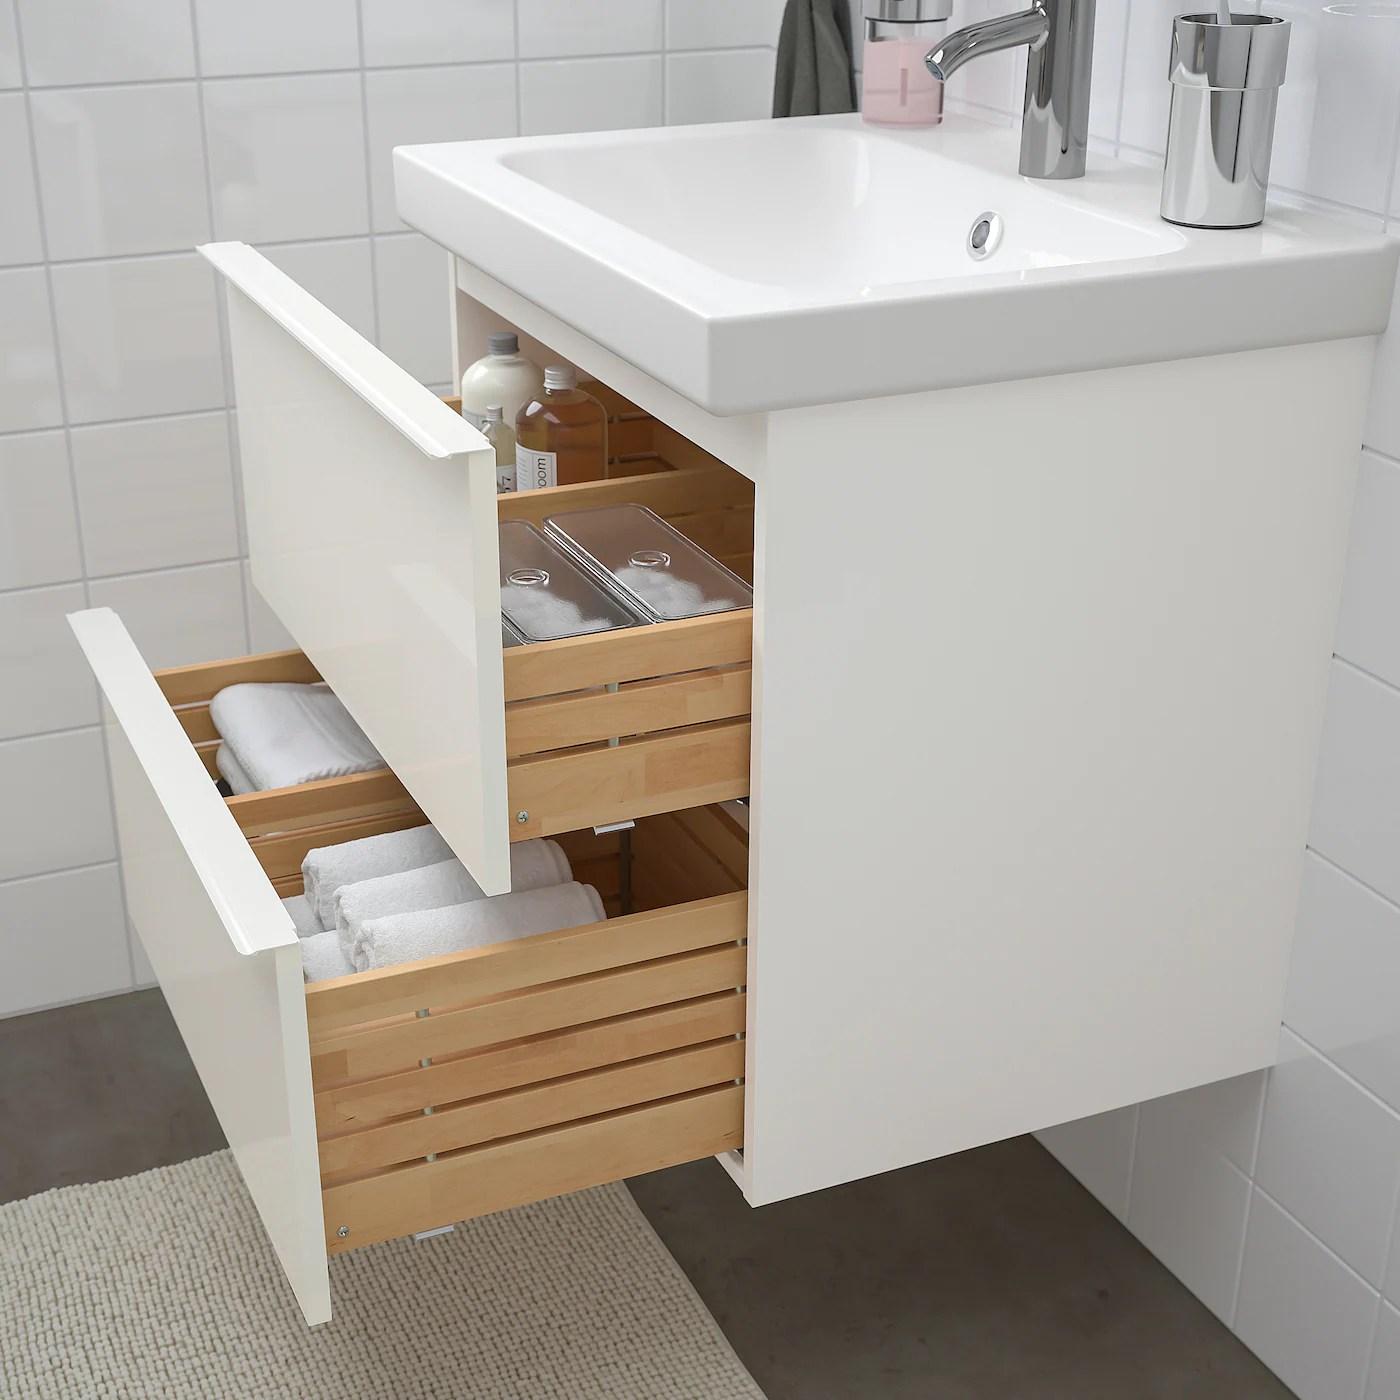 Godmorgon Odensvik Mobilier Salle De Bain 4 Pieces Brillant Blanc Dalskar Mitigeur Lavabo 63 Cm Ikea